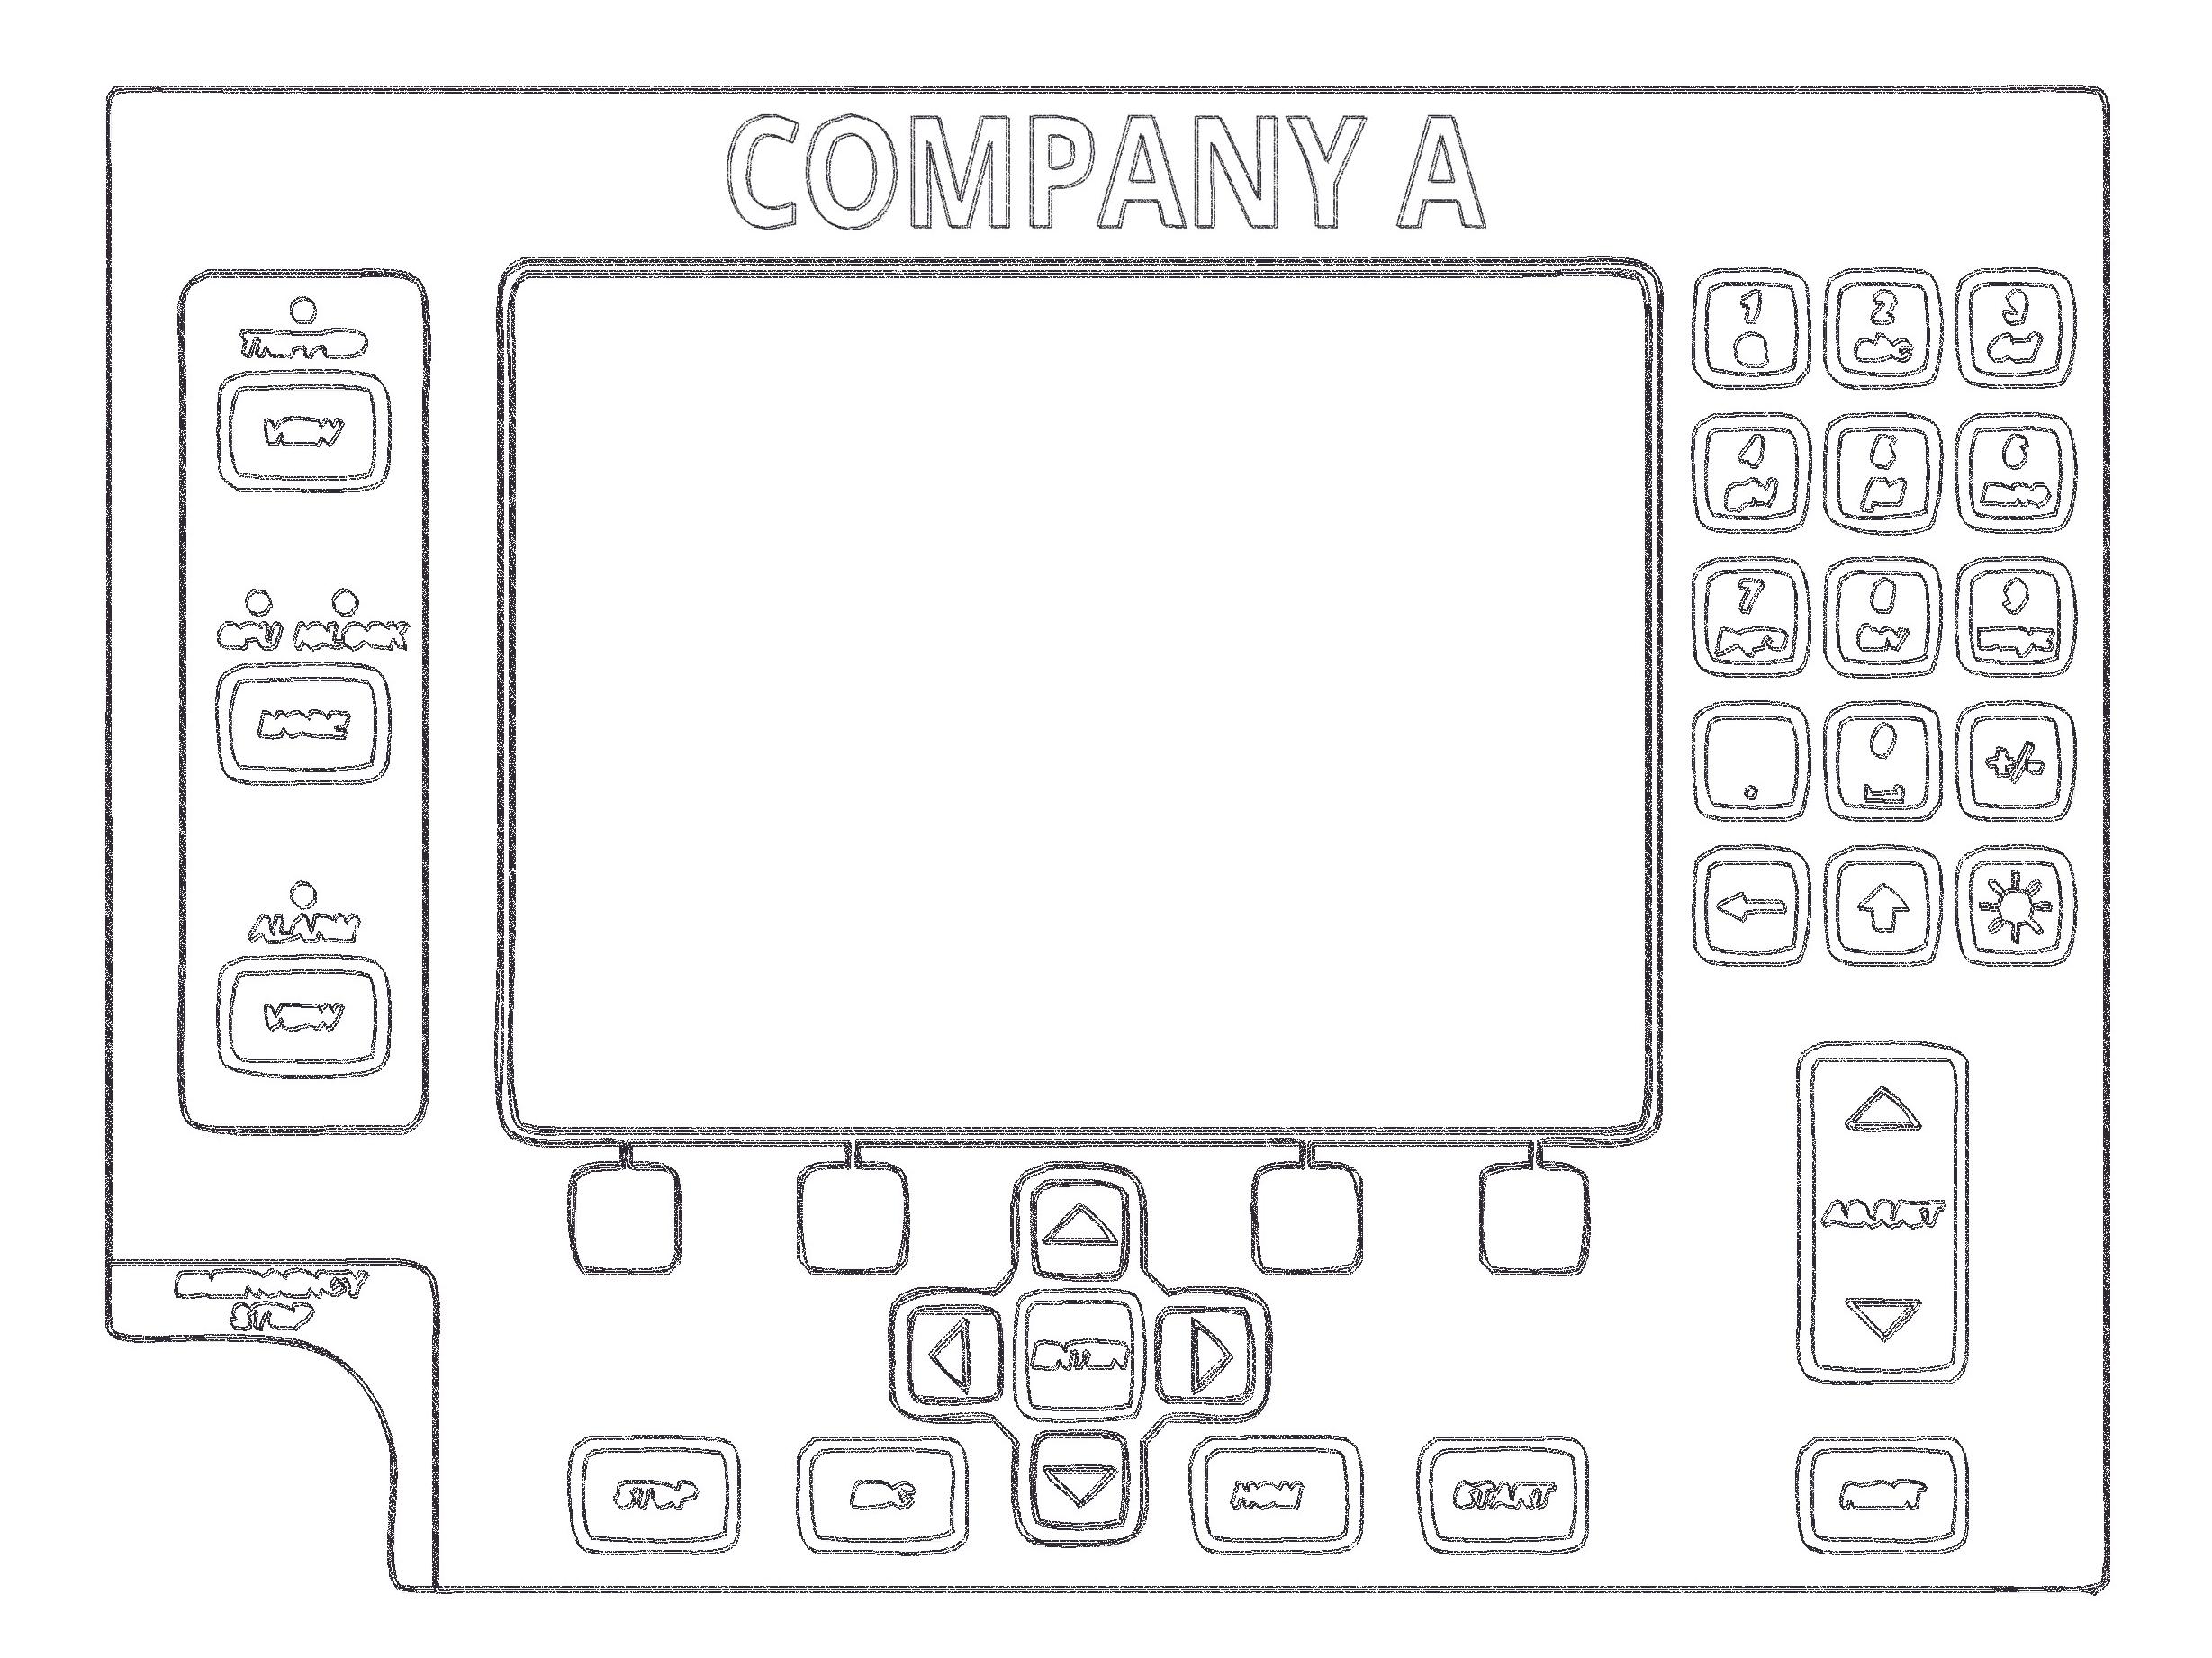 Company A Sketch